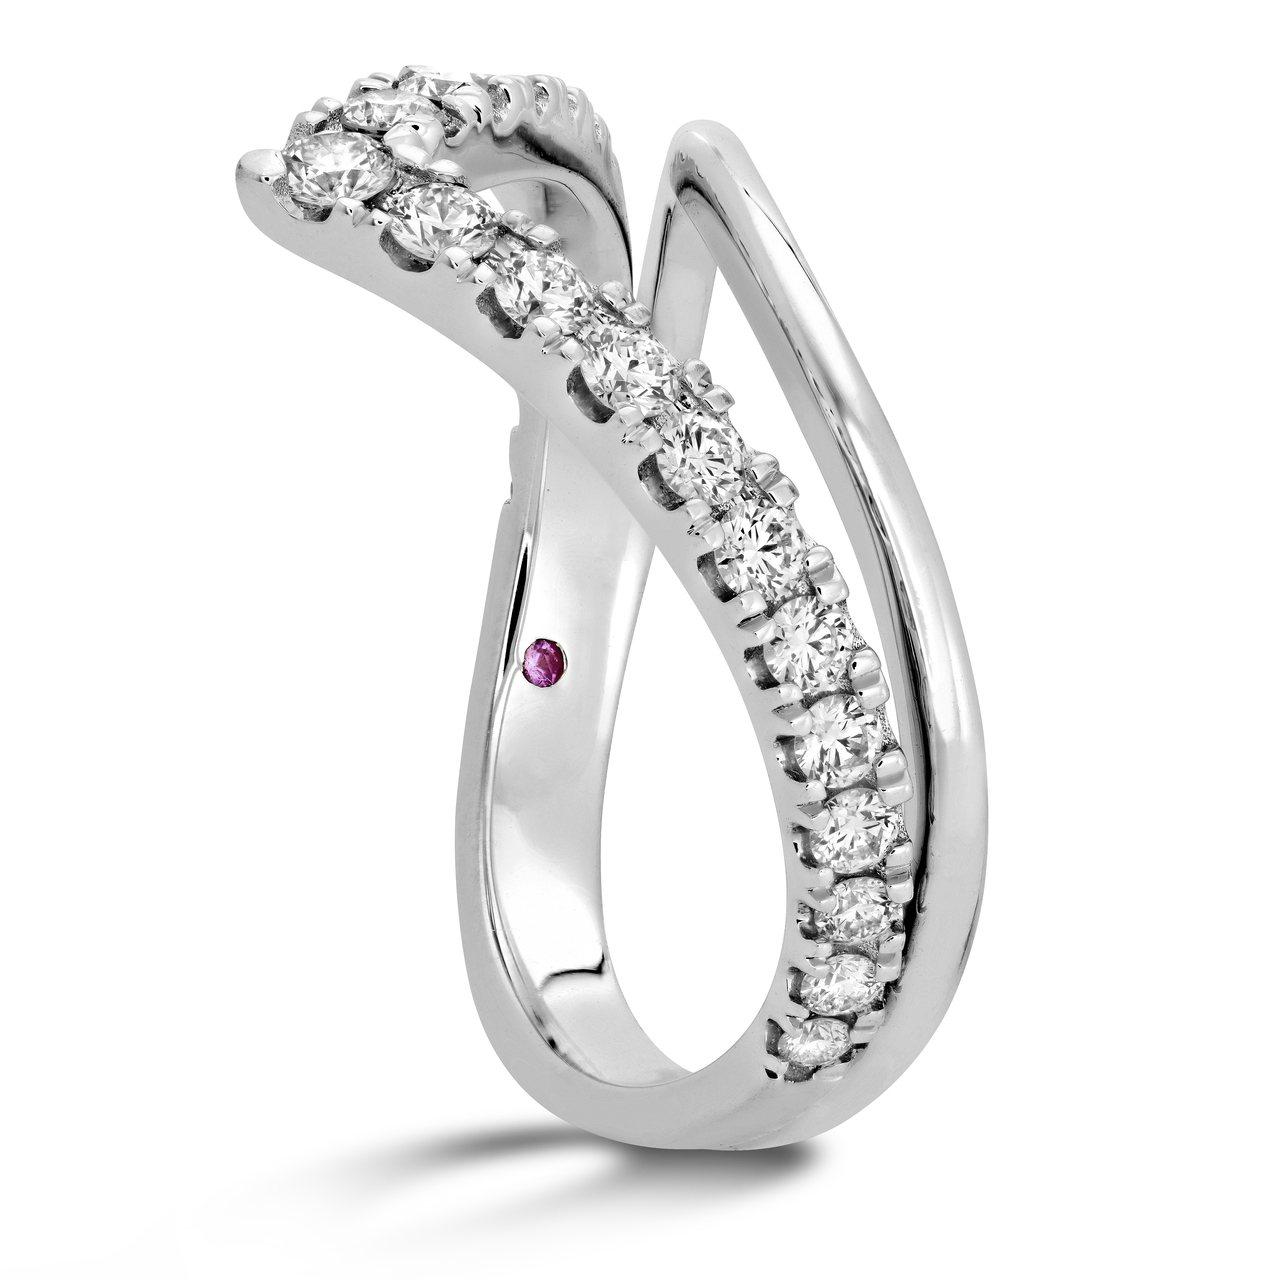 HARLEY SILHOUETTE戒指,白K金、鑽石、粉紅剛玉,售價89,000...